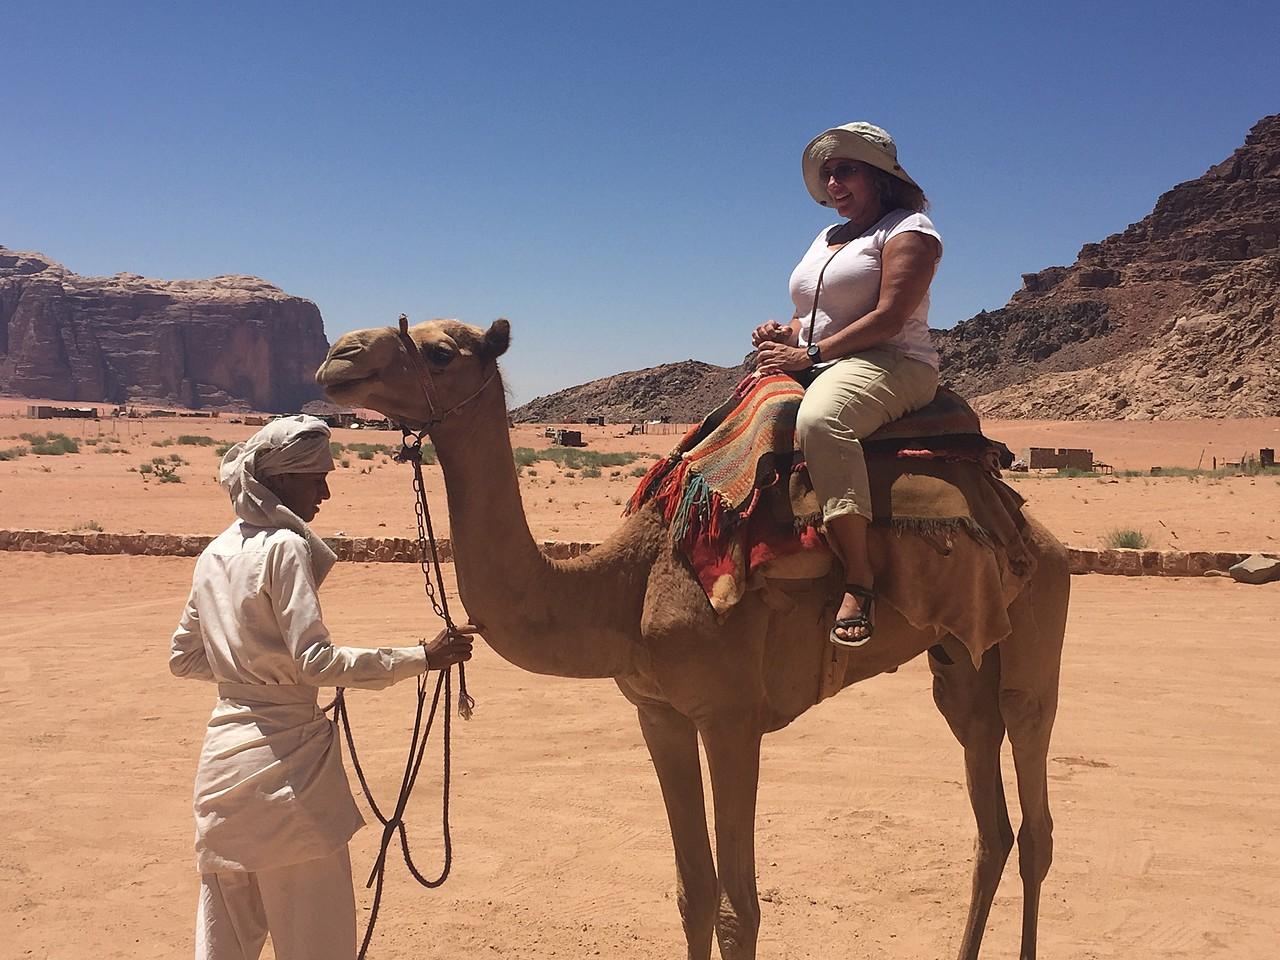 Day 1: Wadi Rum | Photo taken by Mia F